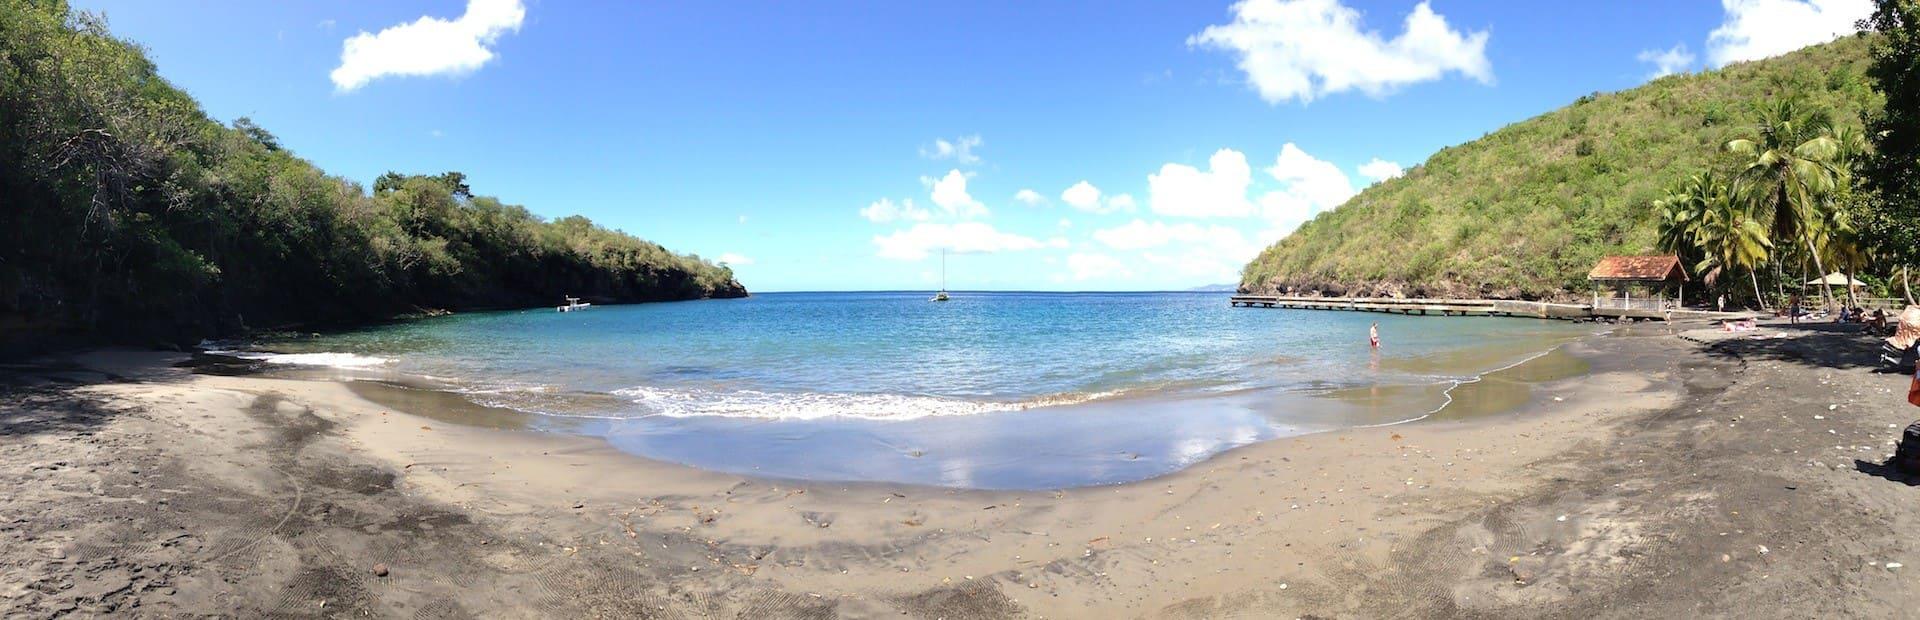 caraibi isole